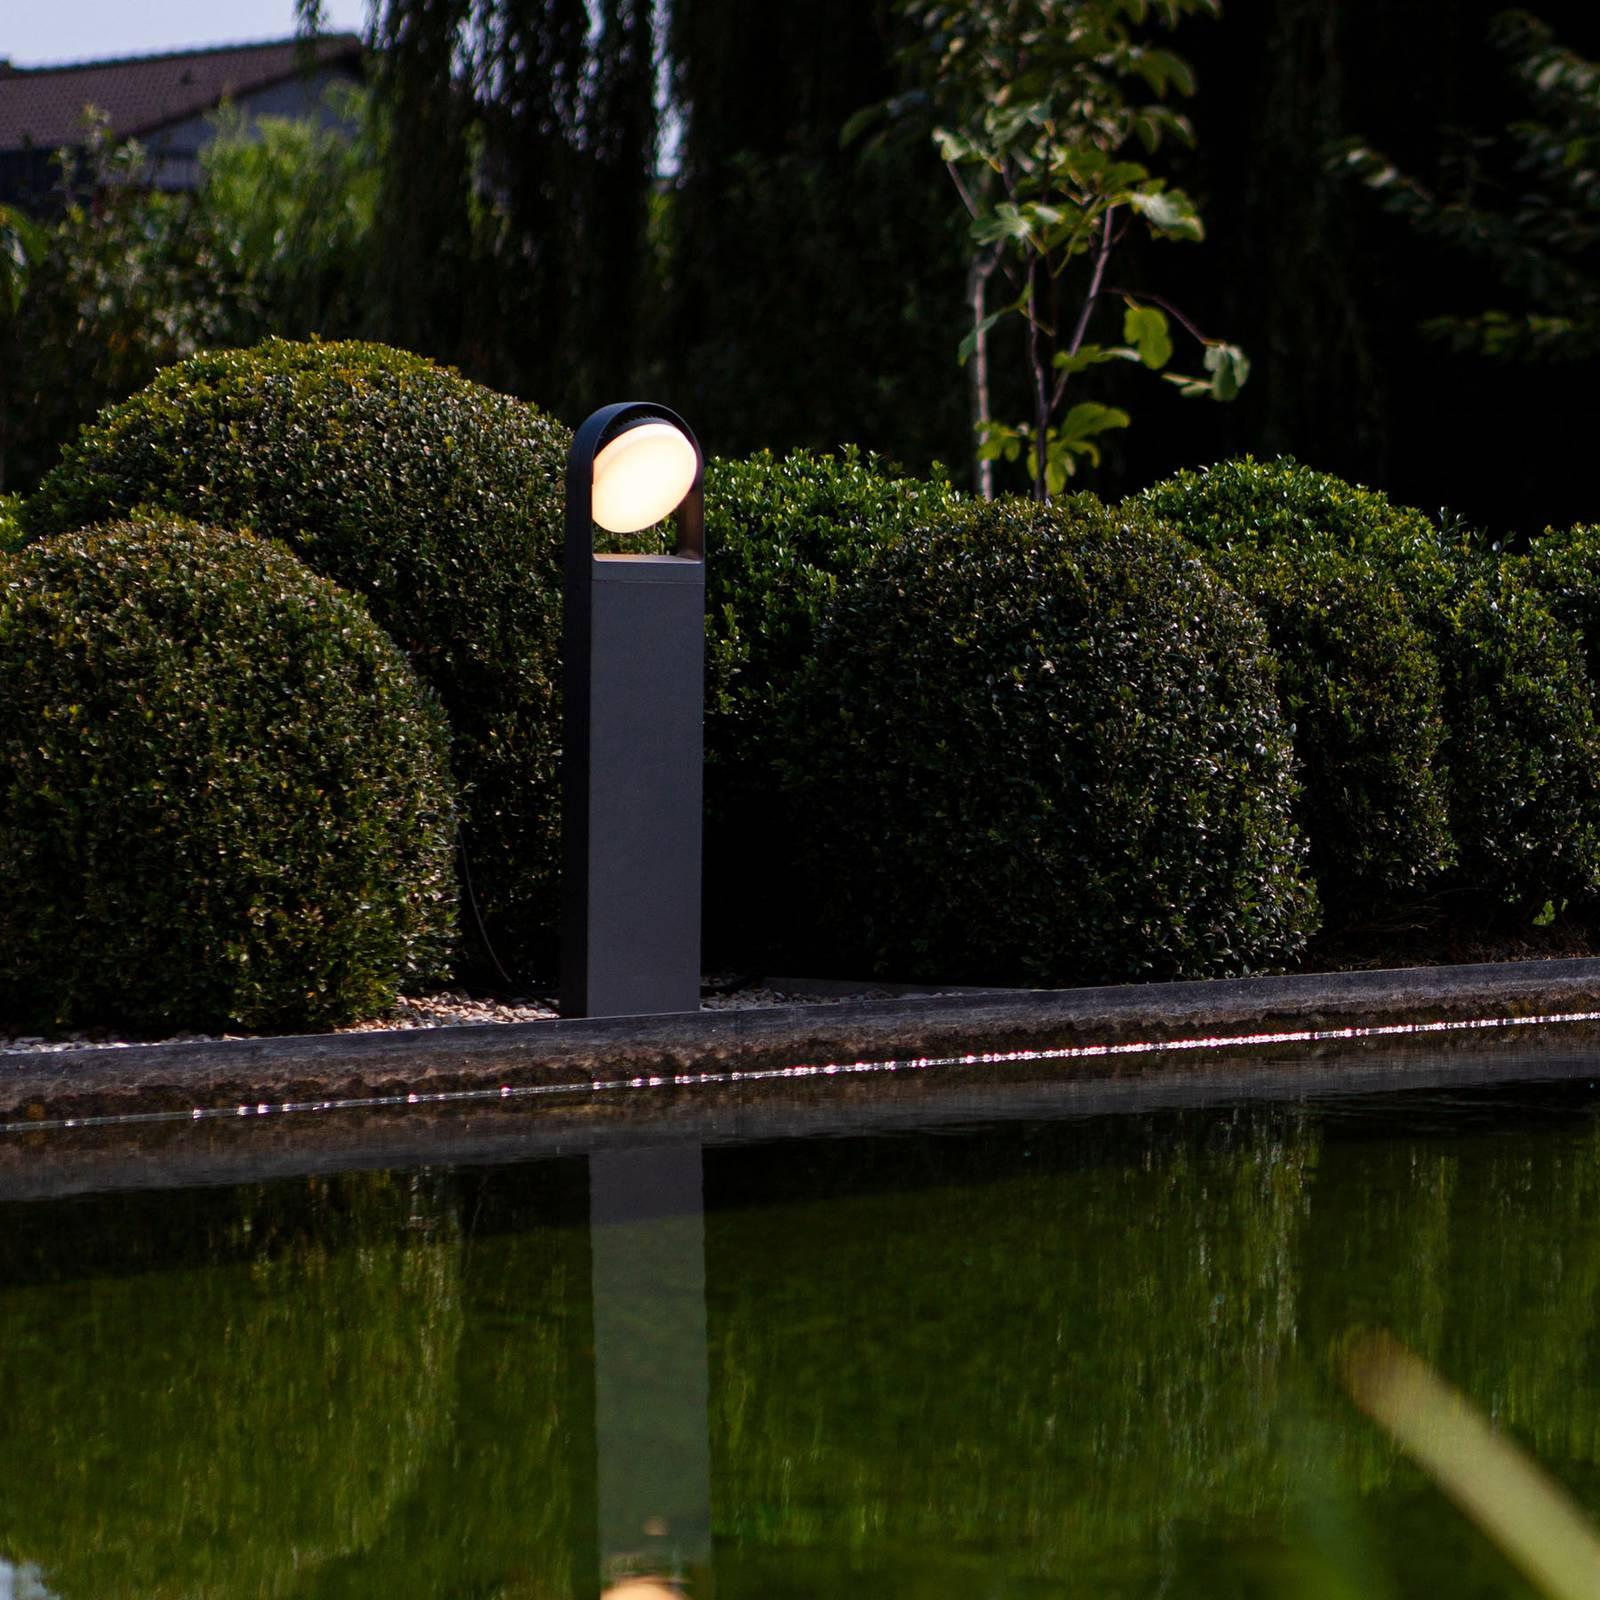 LED-Wegeleuchte Fele anthrazit, drehbar